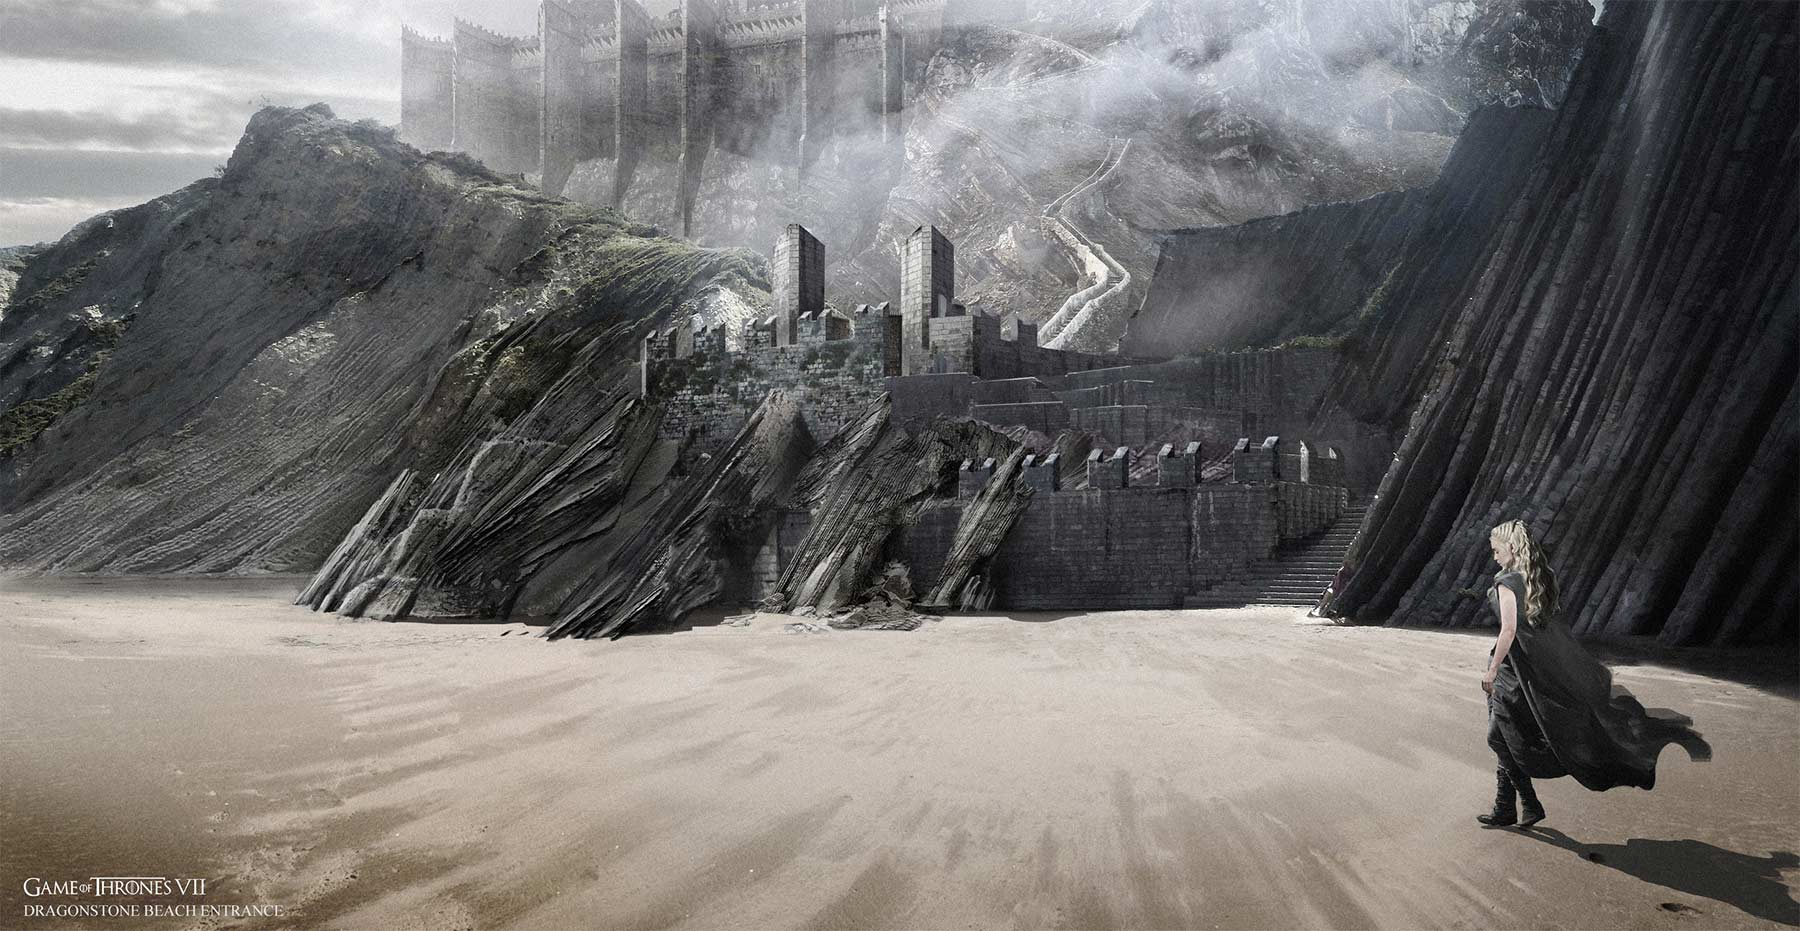 Game of Thrones Staffel 7 Concept Art Kieran-Belshaw-game-of-thrones-concept-art_02